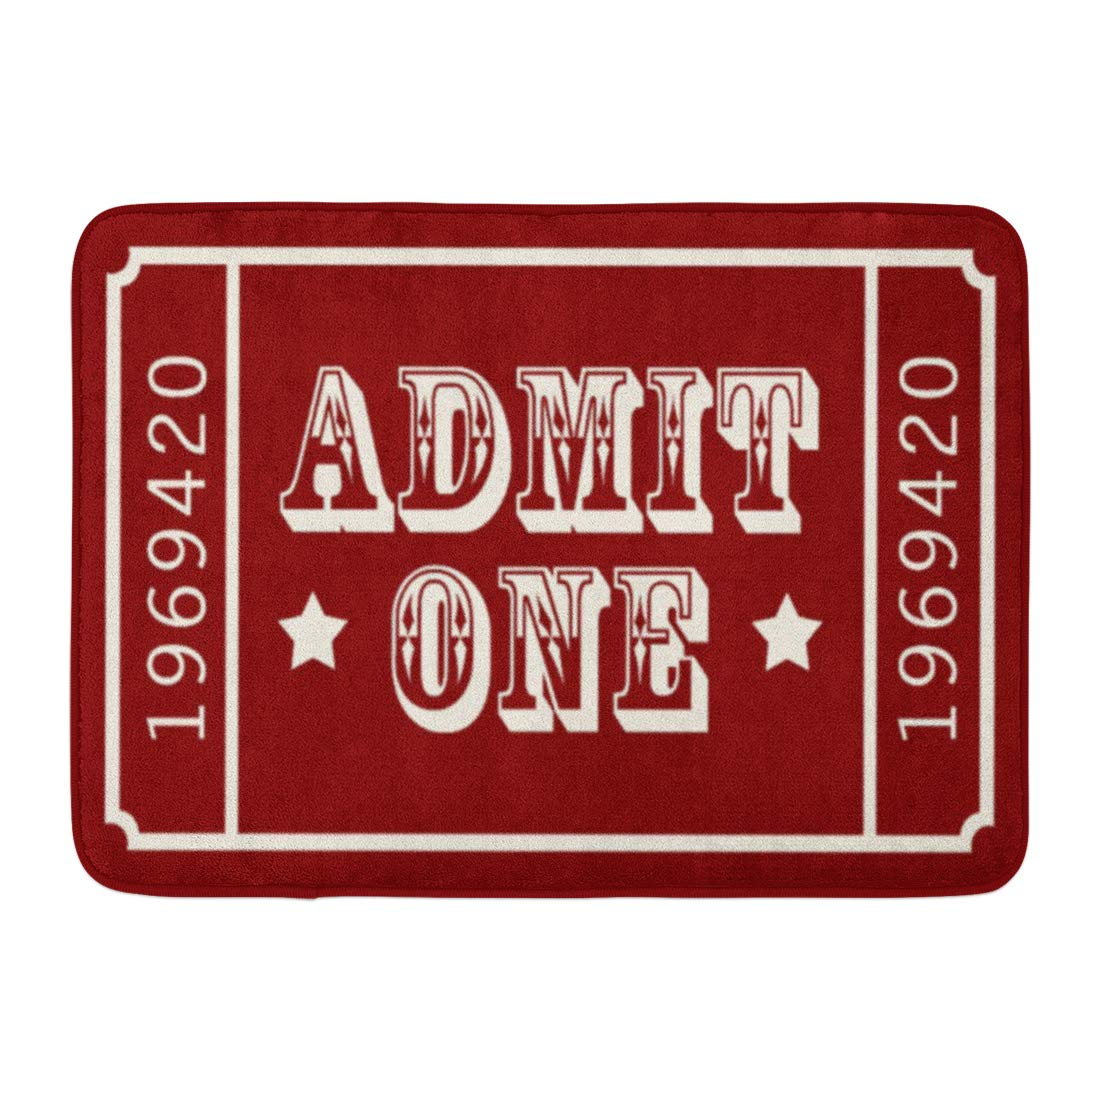 Allenava Bath Mat Red Americana Whimsical Circus Theatre Ticket Admit Movie Bathroom Decor Rug 16'' x 24''